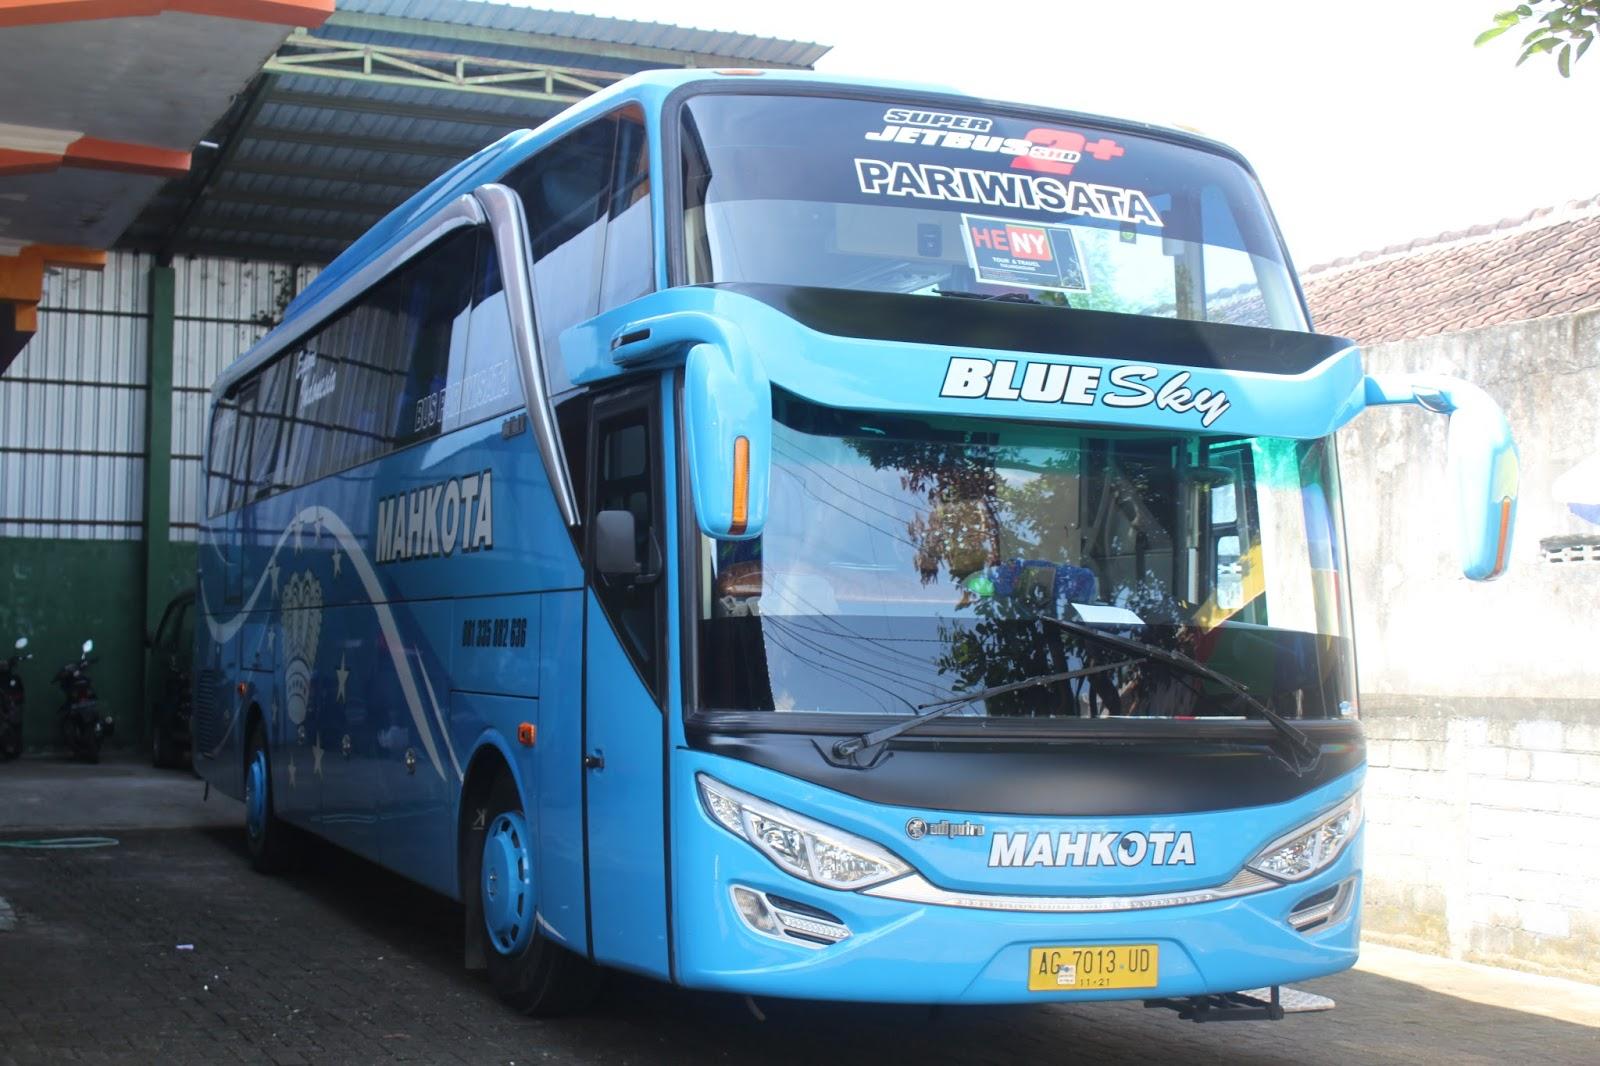 Heny Tour dan Travel Tulungagung: Galery Foto Bus, Mini Bus, Toyota